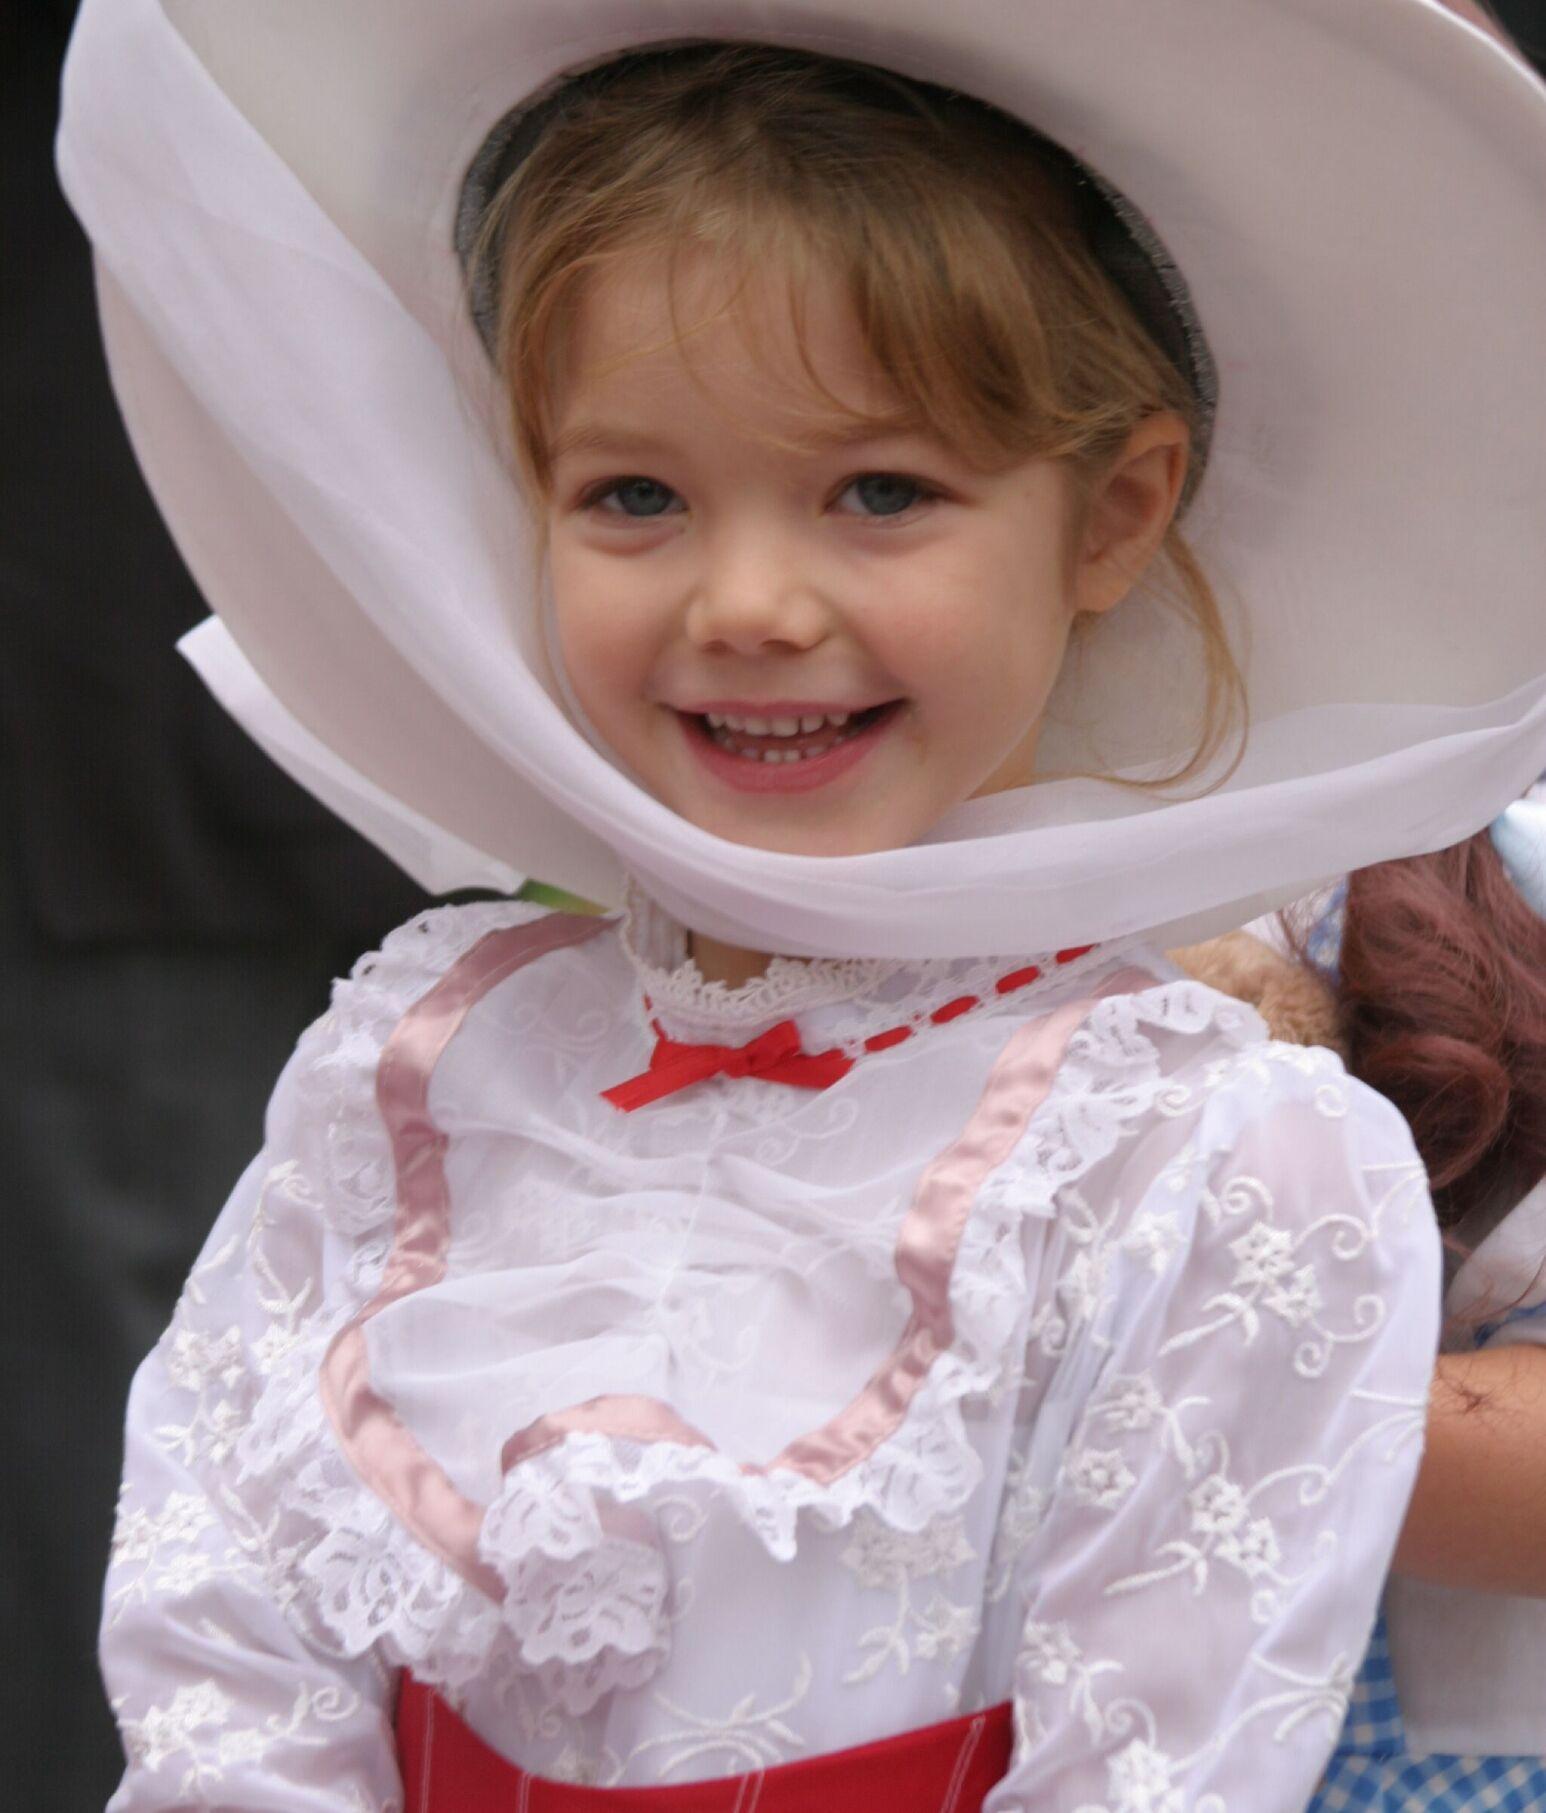 Childhood photo of Annika